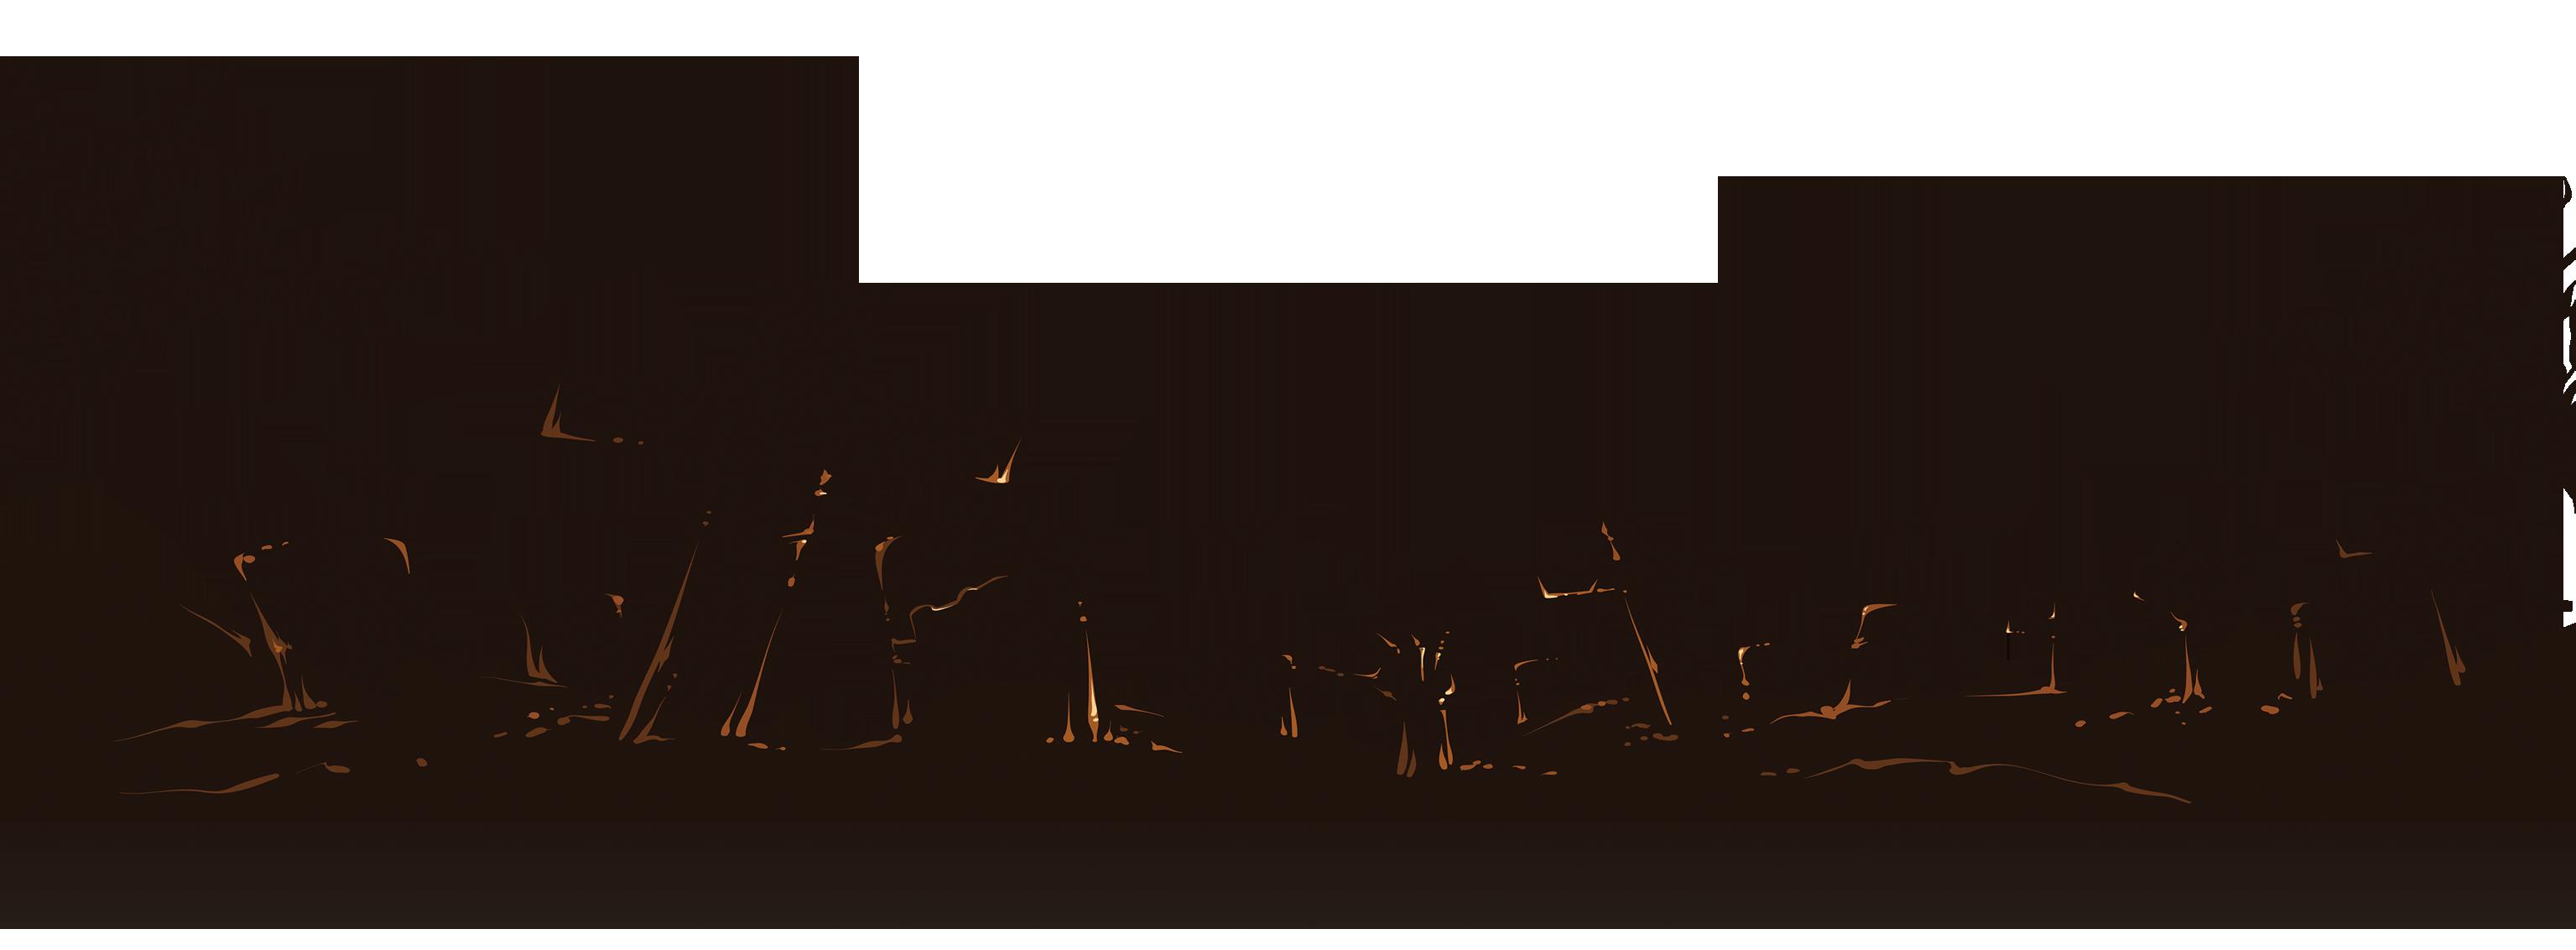 Graveyard clipart church cemetery, Graveyard church cemetery.